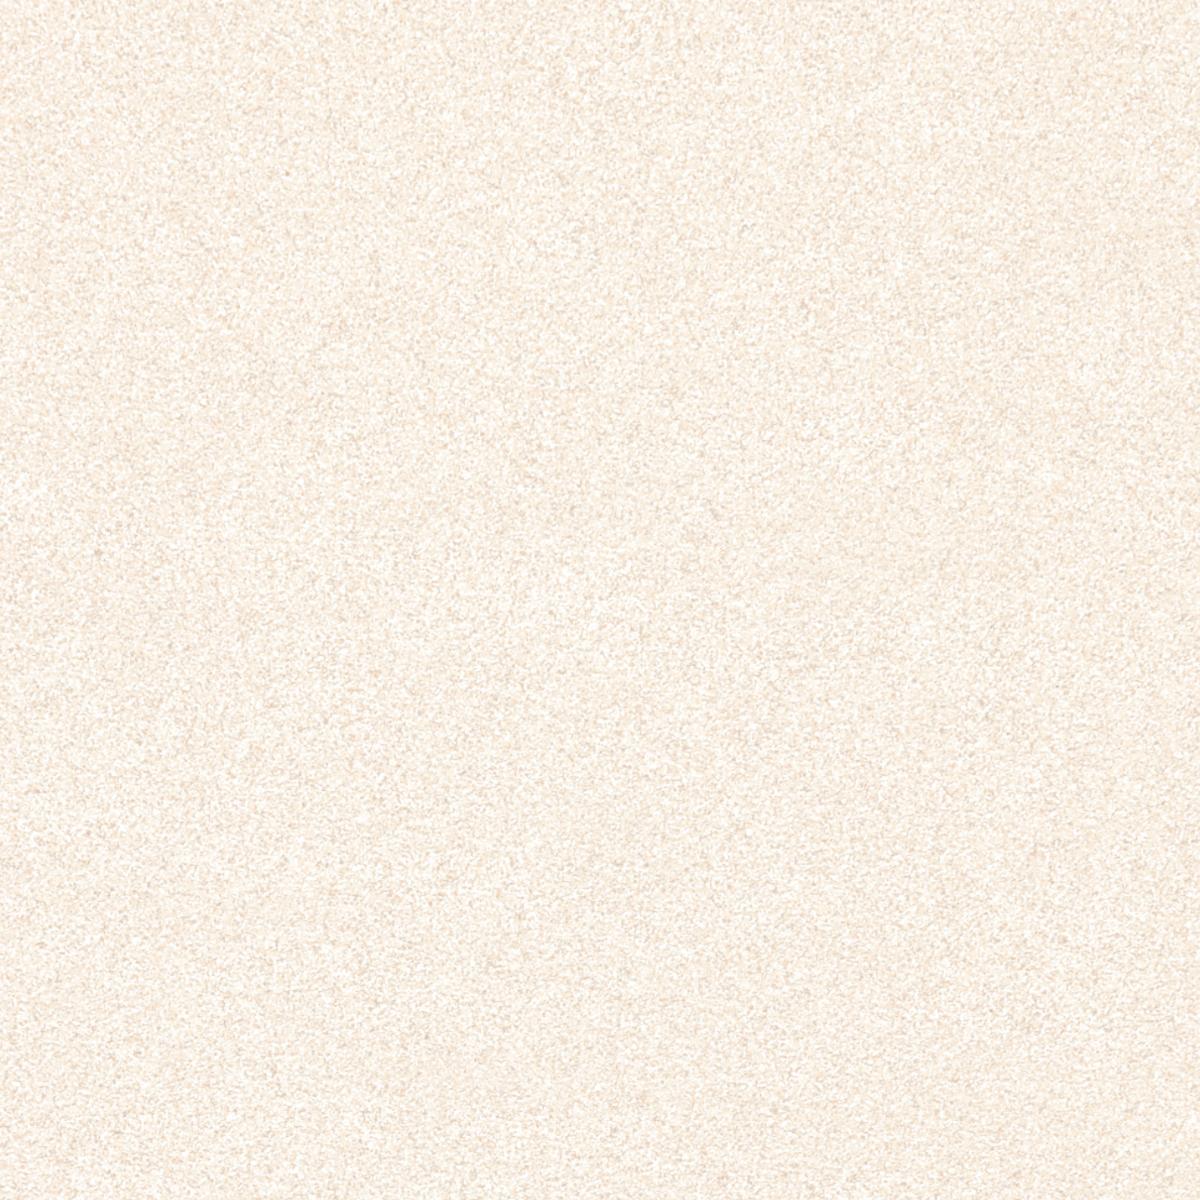 GFT SPF Sand EC Crema